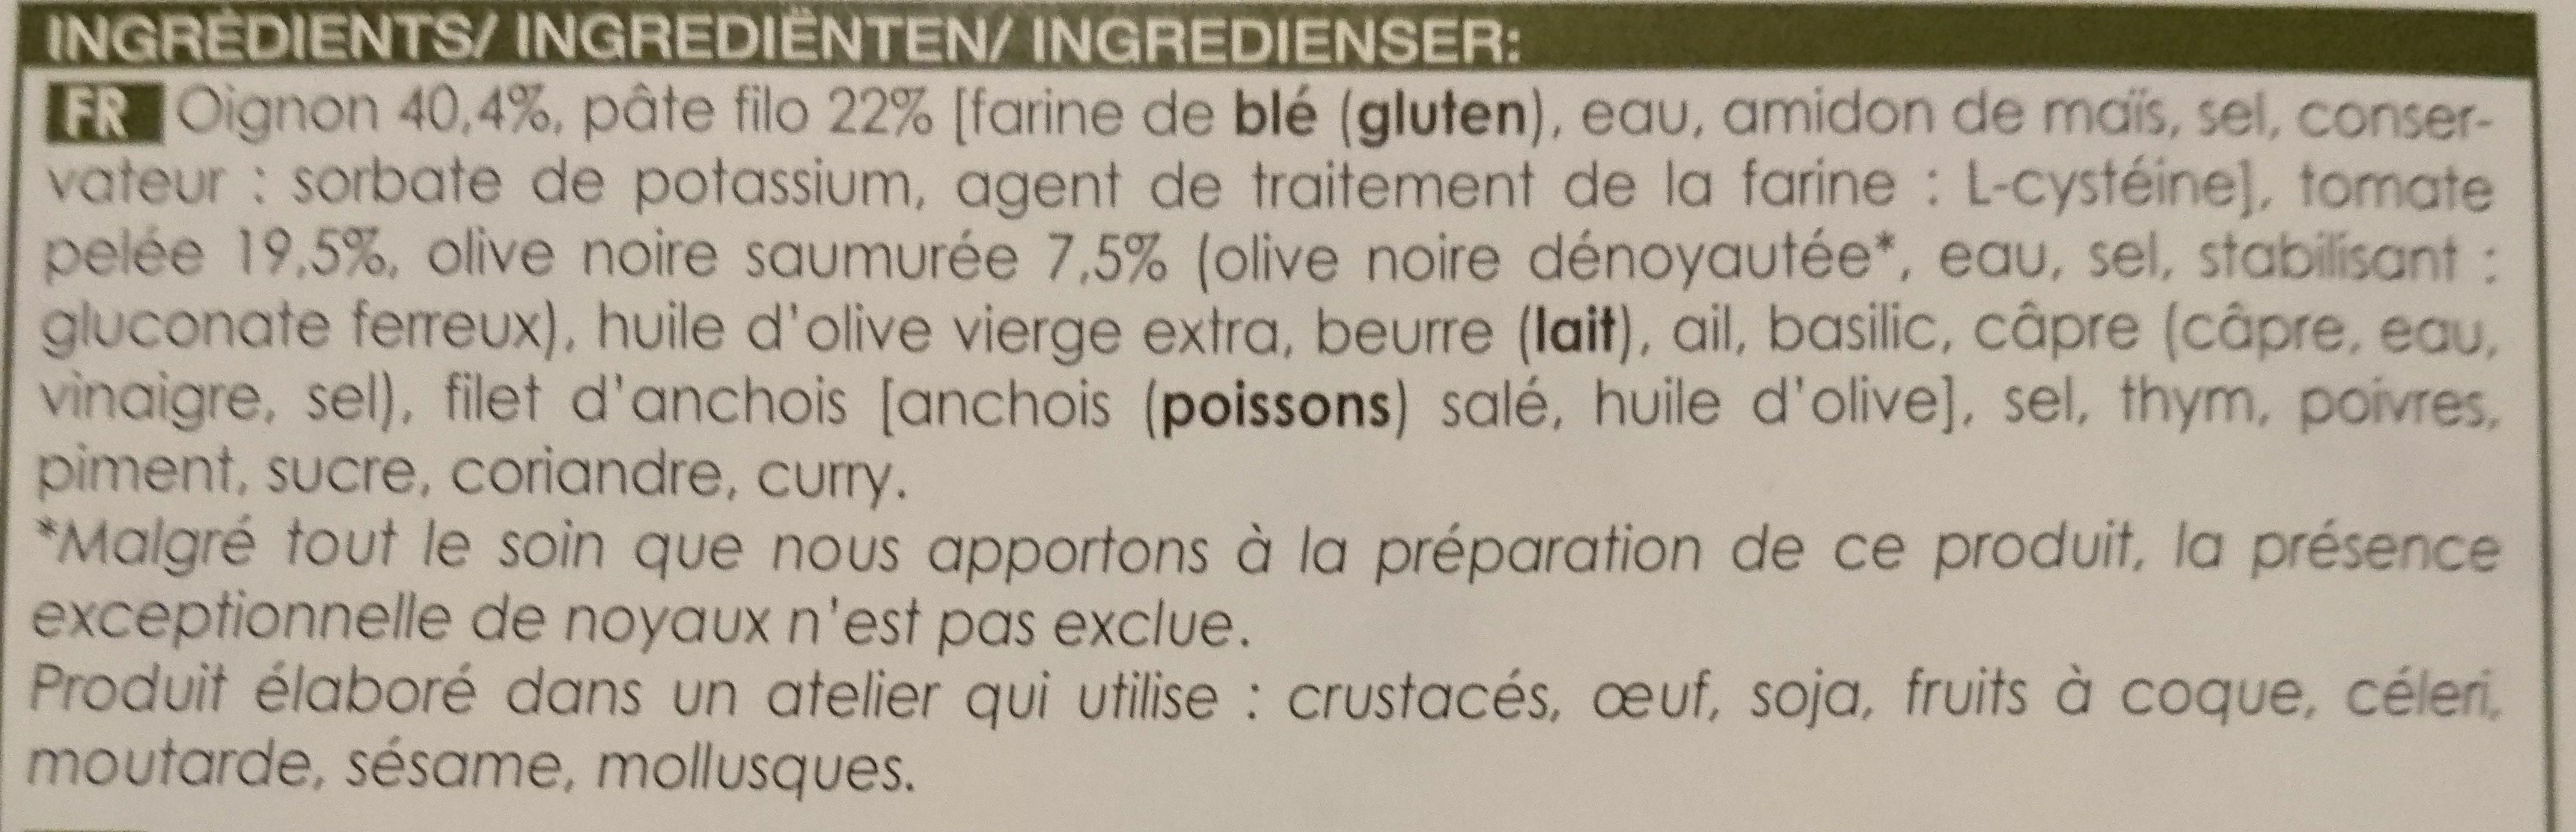 Pastillas oignons tomates olives - Ingredients